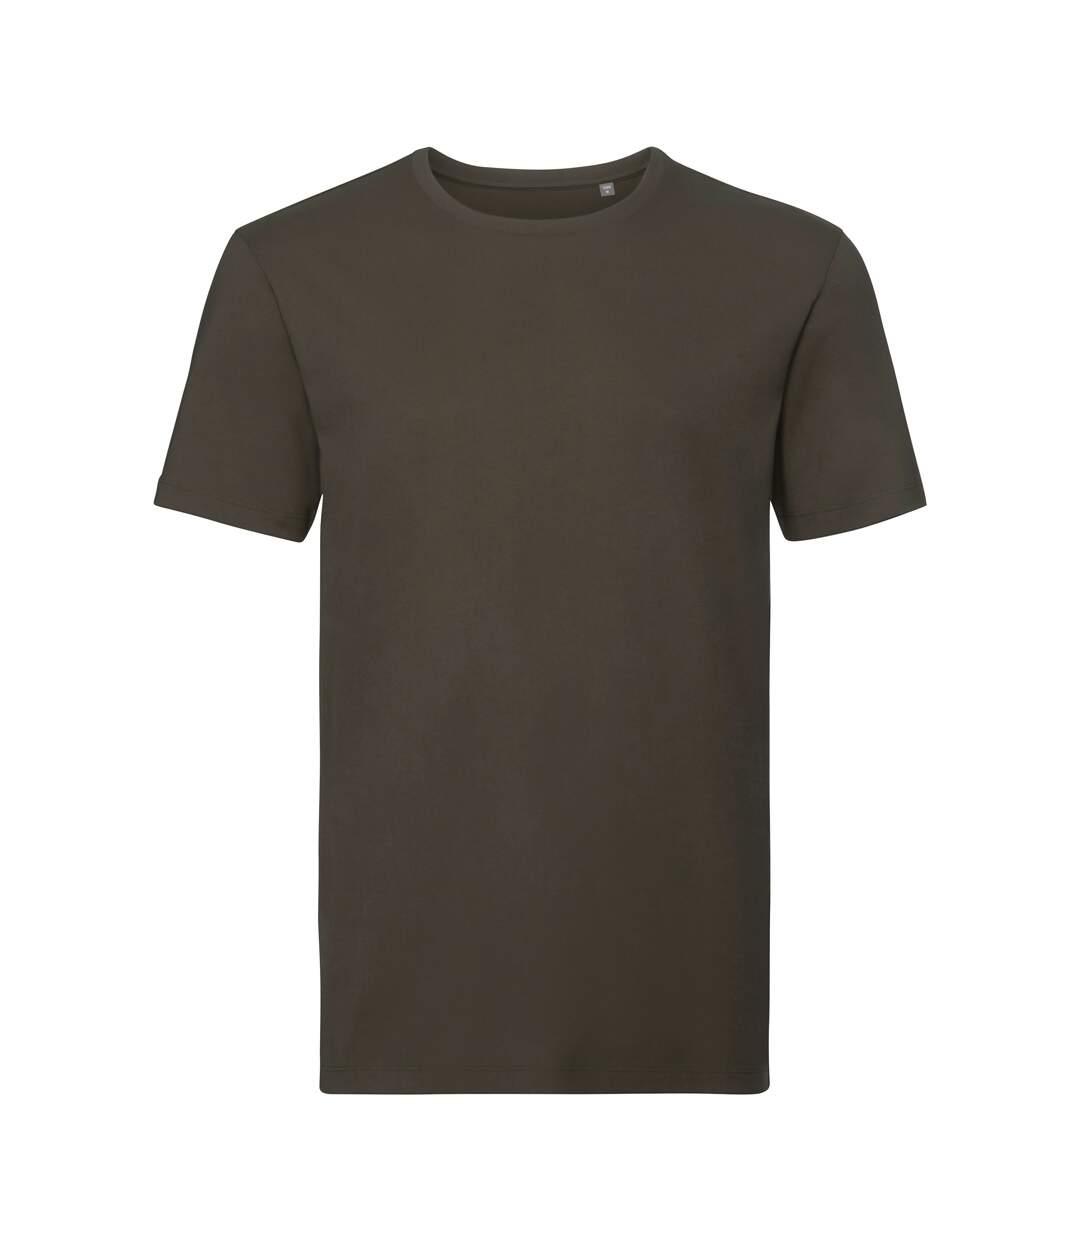 Russell Mens Authentic Pure Organic T-Shirt (Dark Olive) - UTPC3569